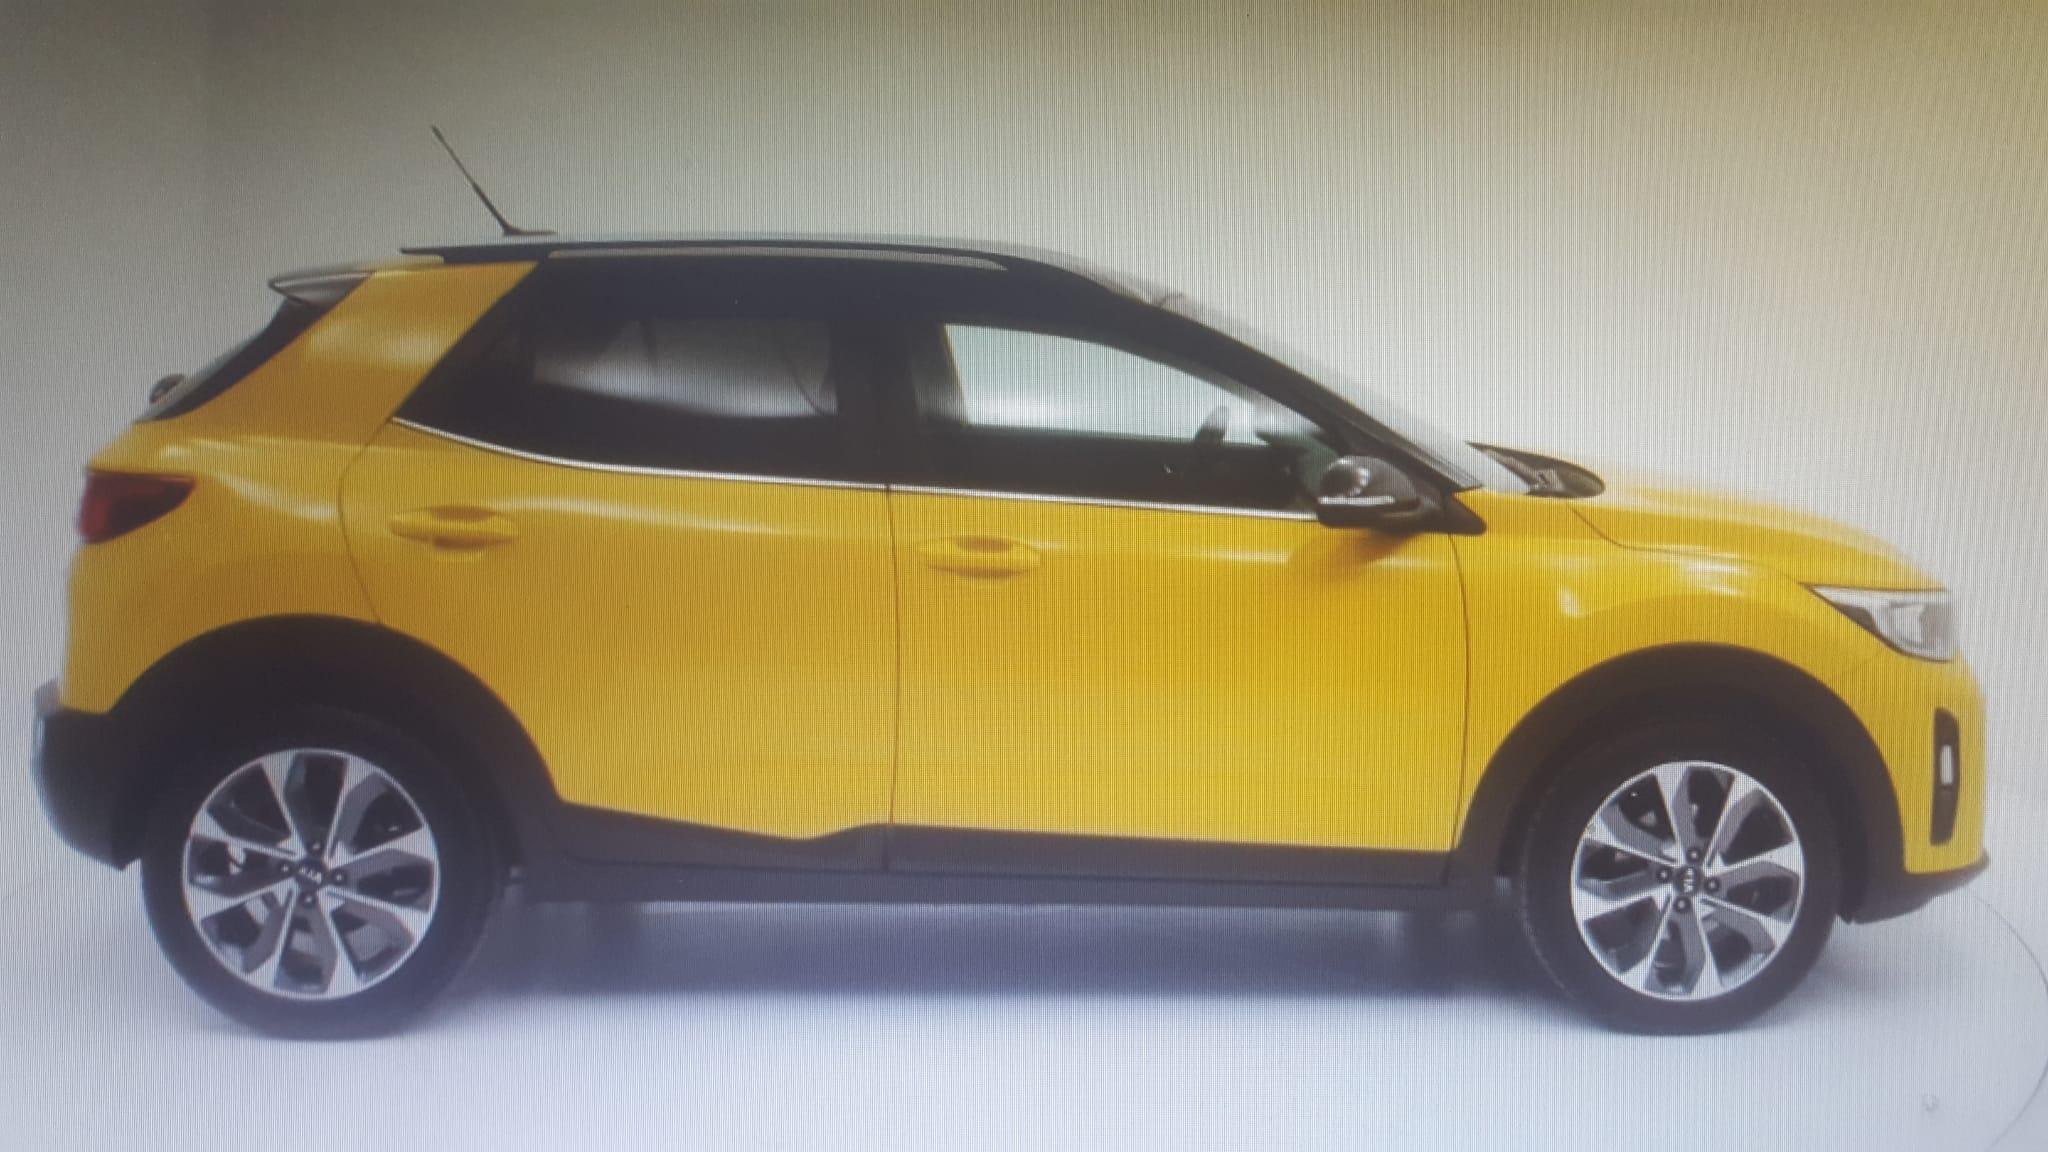 Kia stonic 1.0 t-gdi 88kw  (120cv)Drive eco-dynam  02/2018 14500€:  de Automòbils Rambla